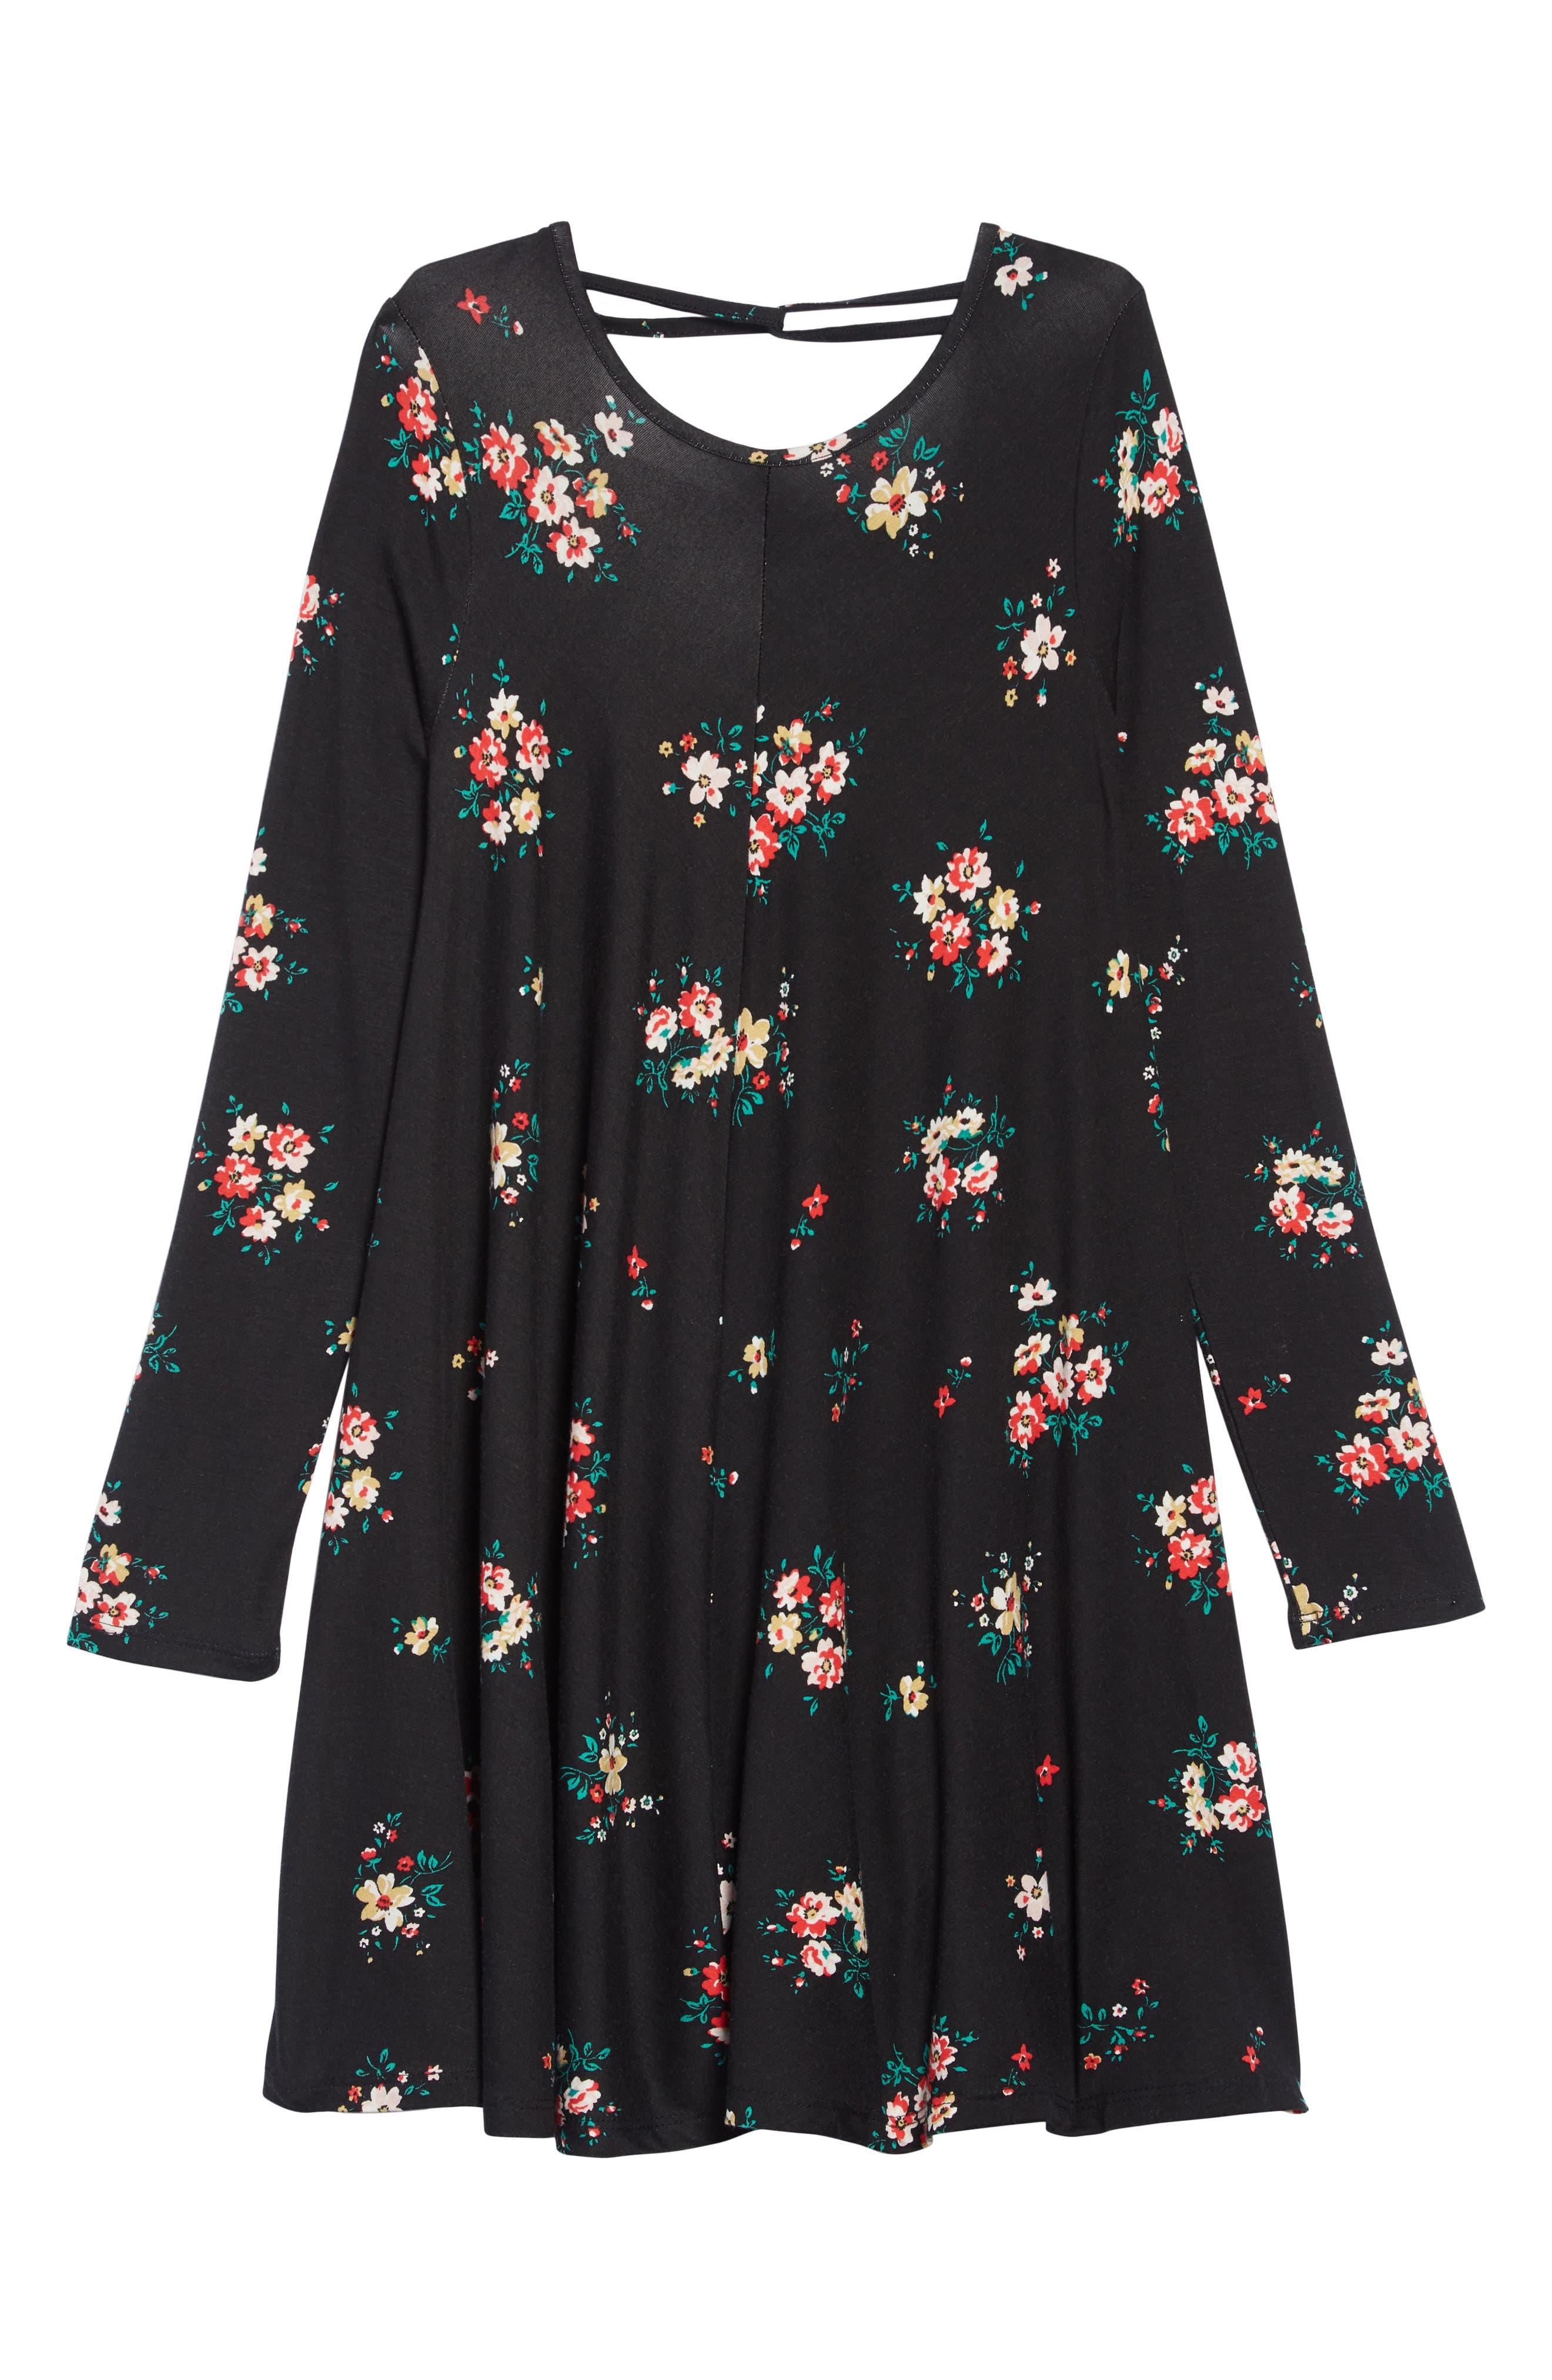 Printed Crisscross Back Shift Dress,                             Main thumbnail 1, color,                             BLACK PRETTY FLORAL